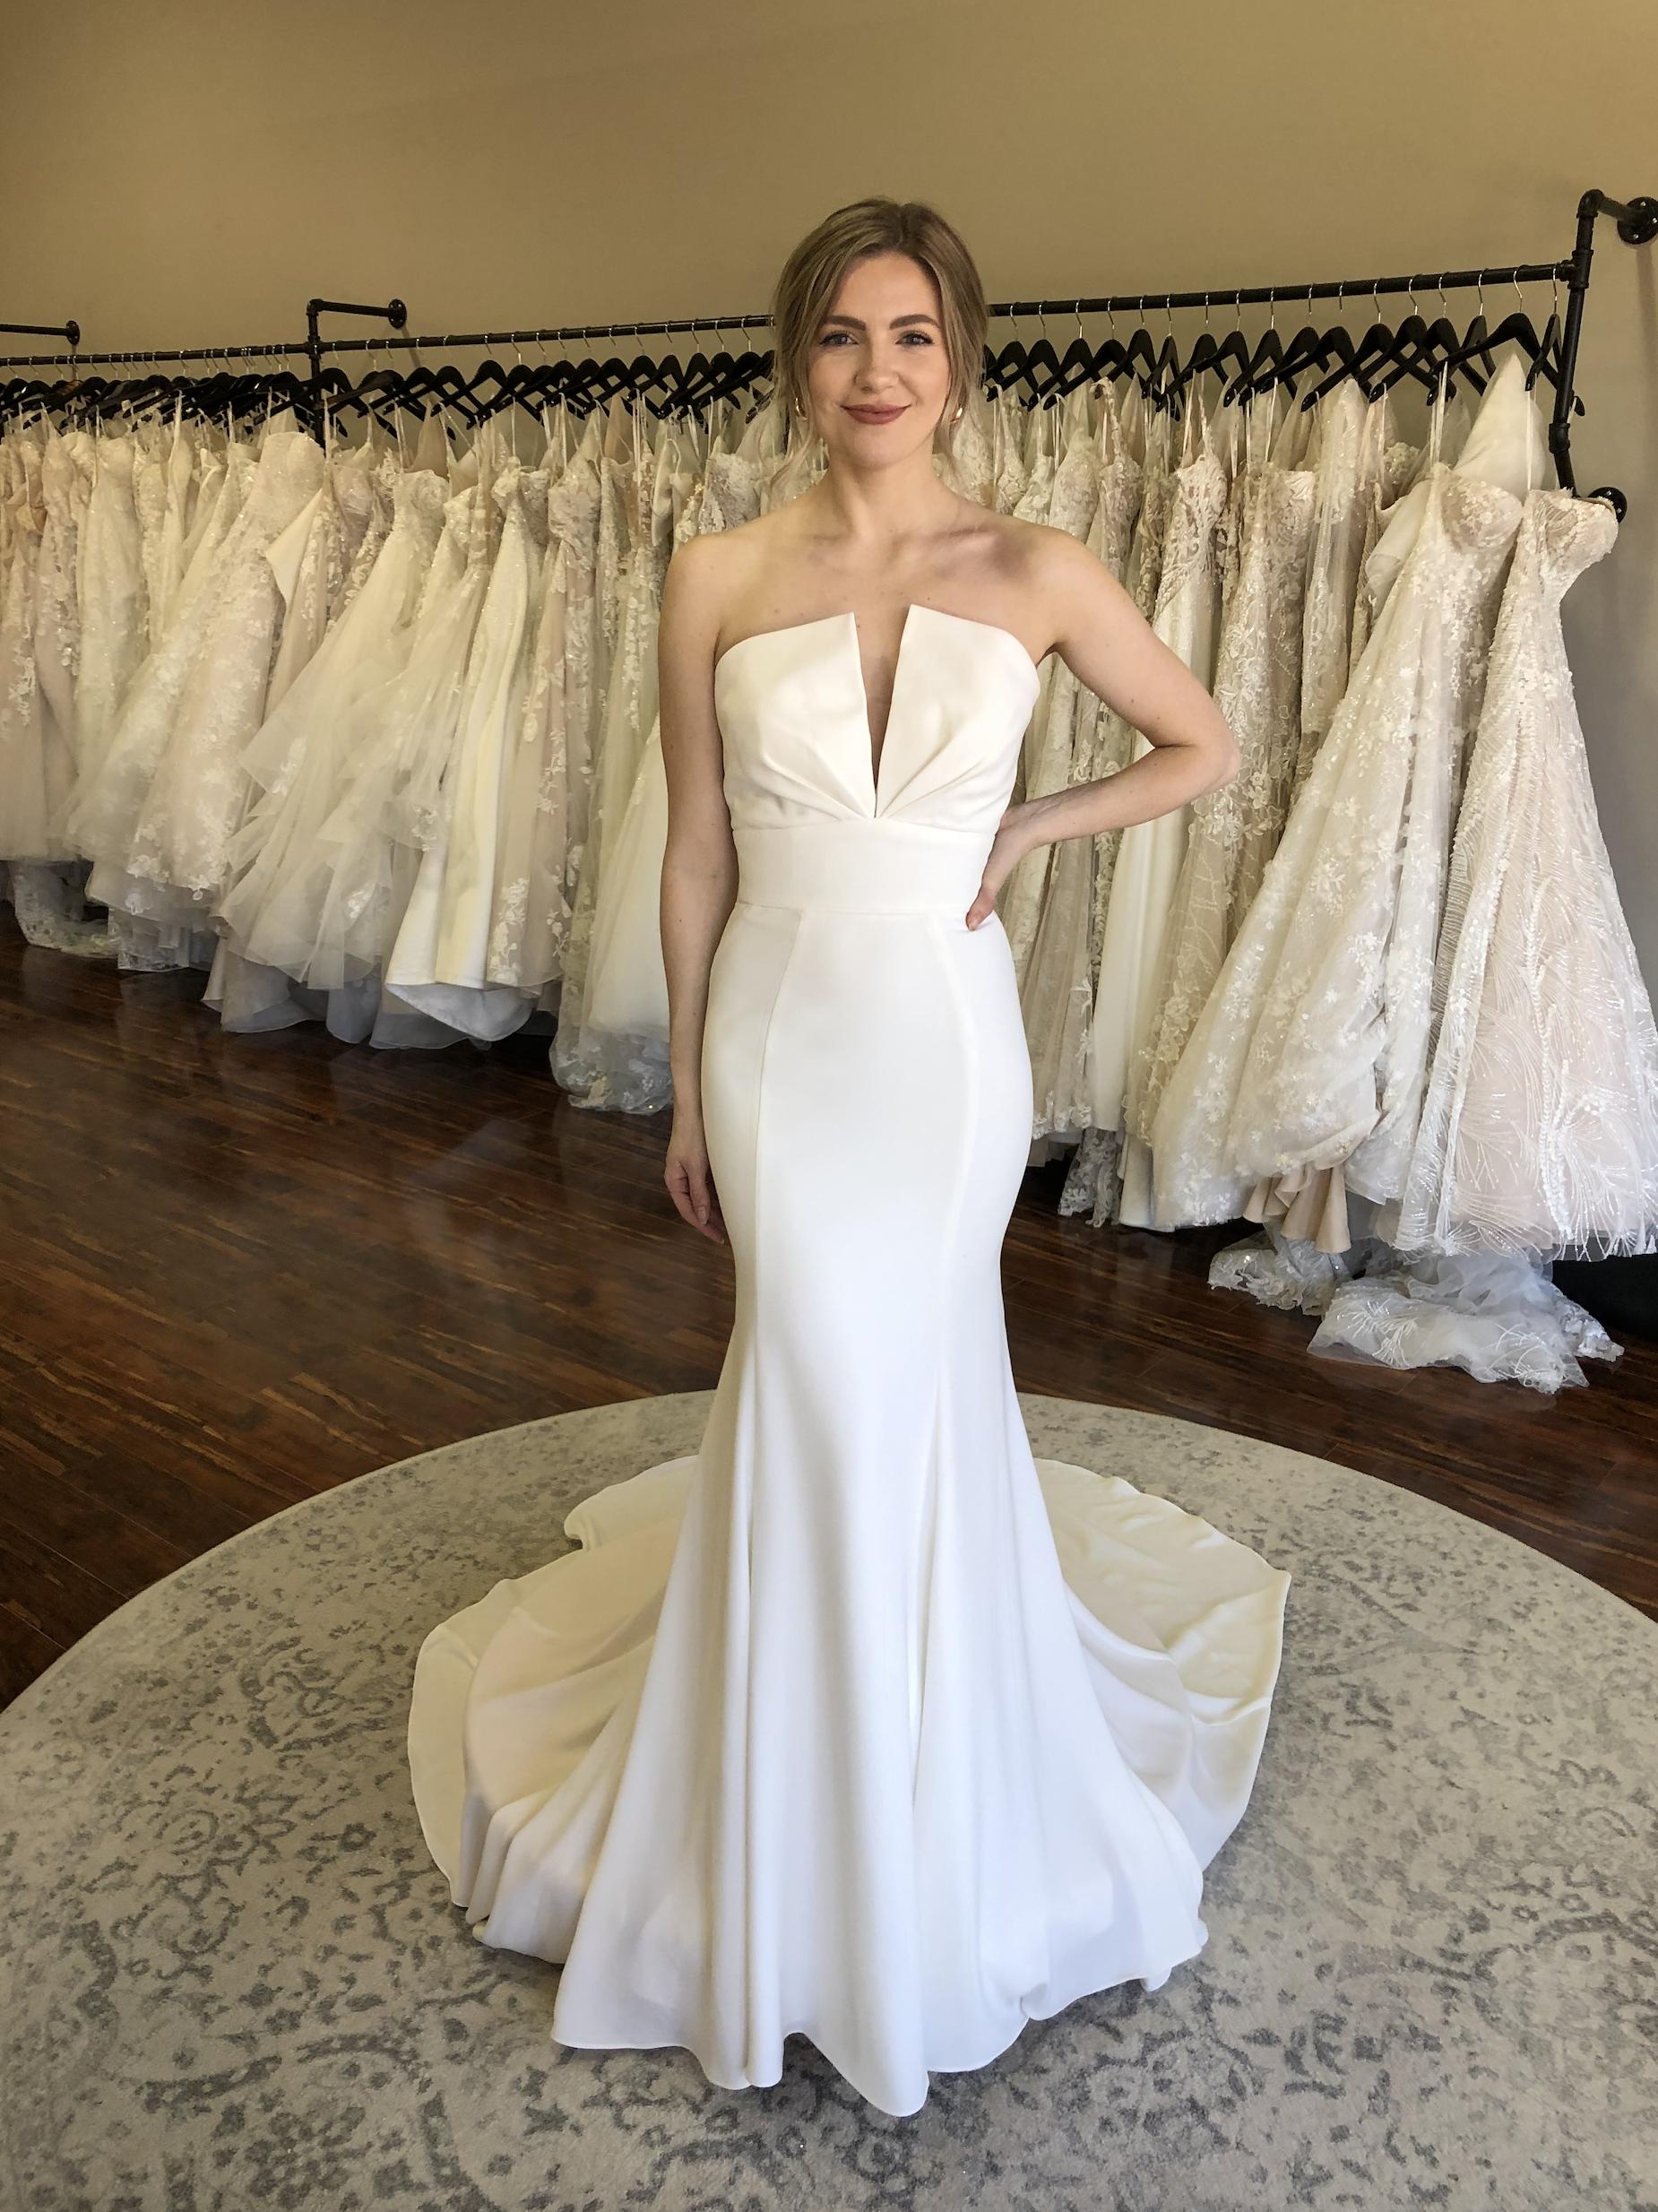 Camryn James Blair In 2021 Wedding Dresses Mermaid Wedding Dress Dresses [ 2468 x 1850 Pixel ]